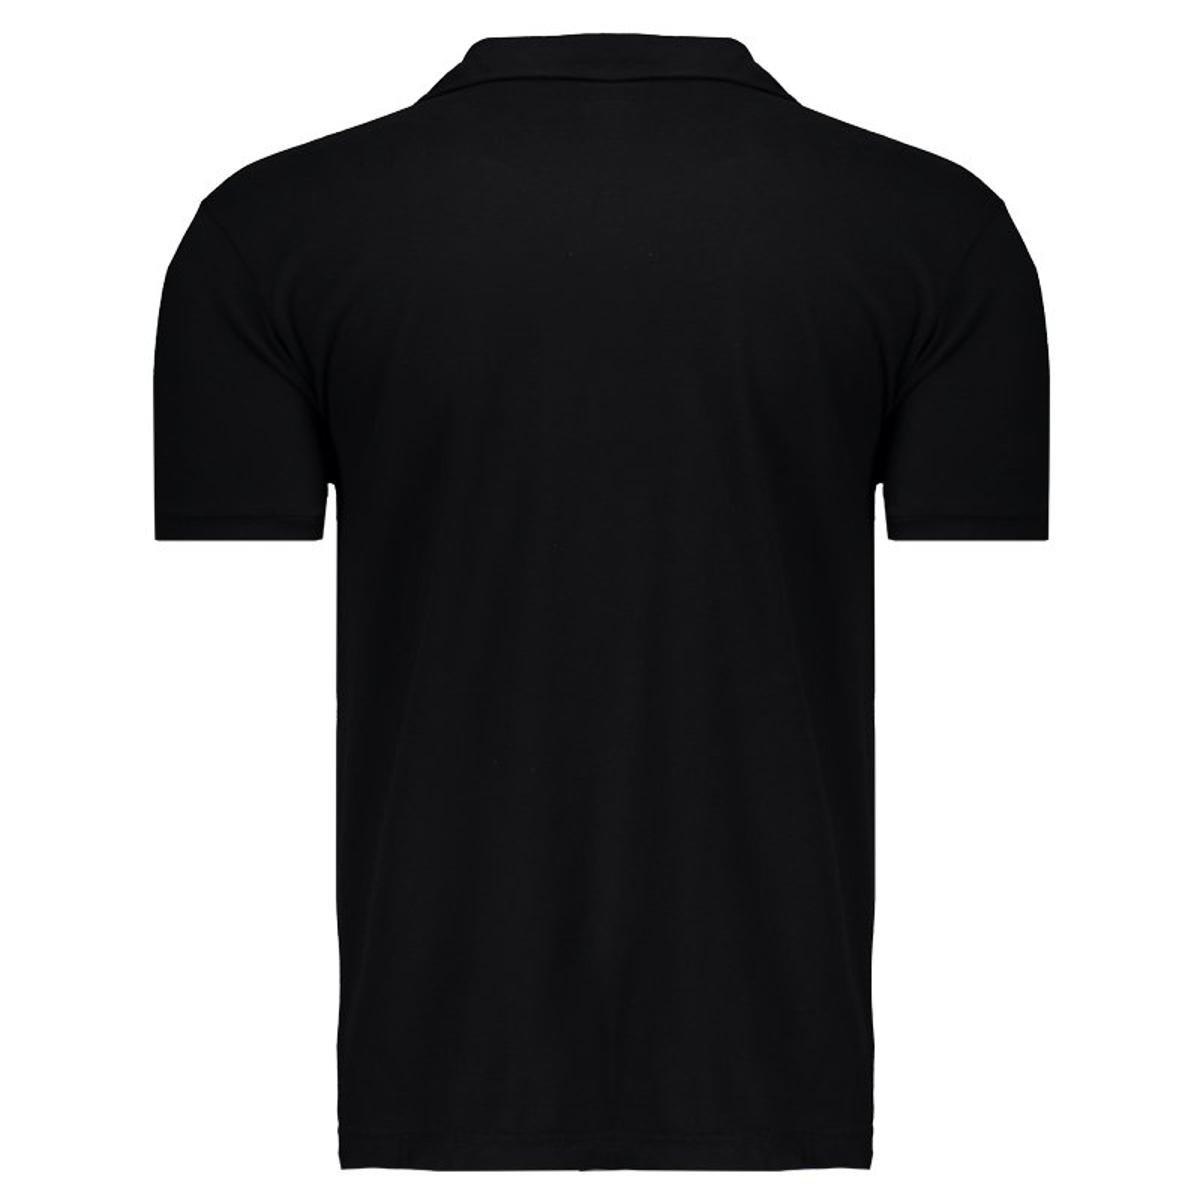 6d5115038b Camisa Retrô Corinthians Casual 1910 Masculina - Compre Agora